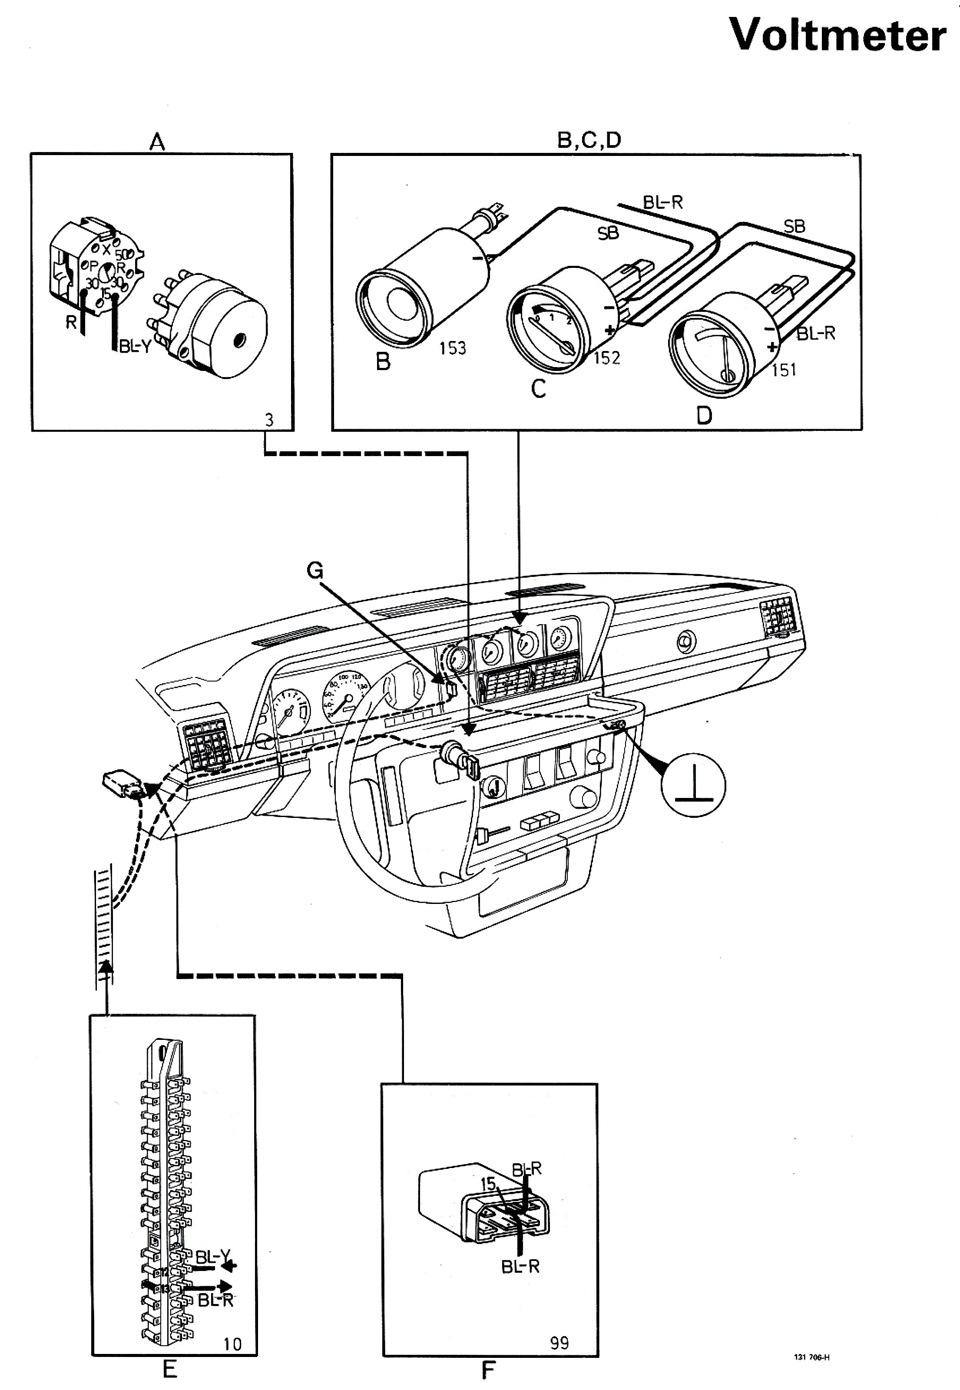 схема соединение вольтметра фото